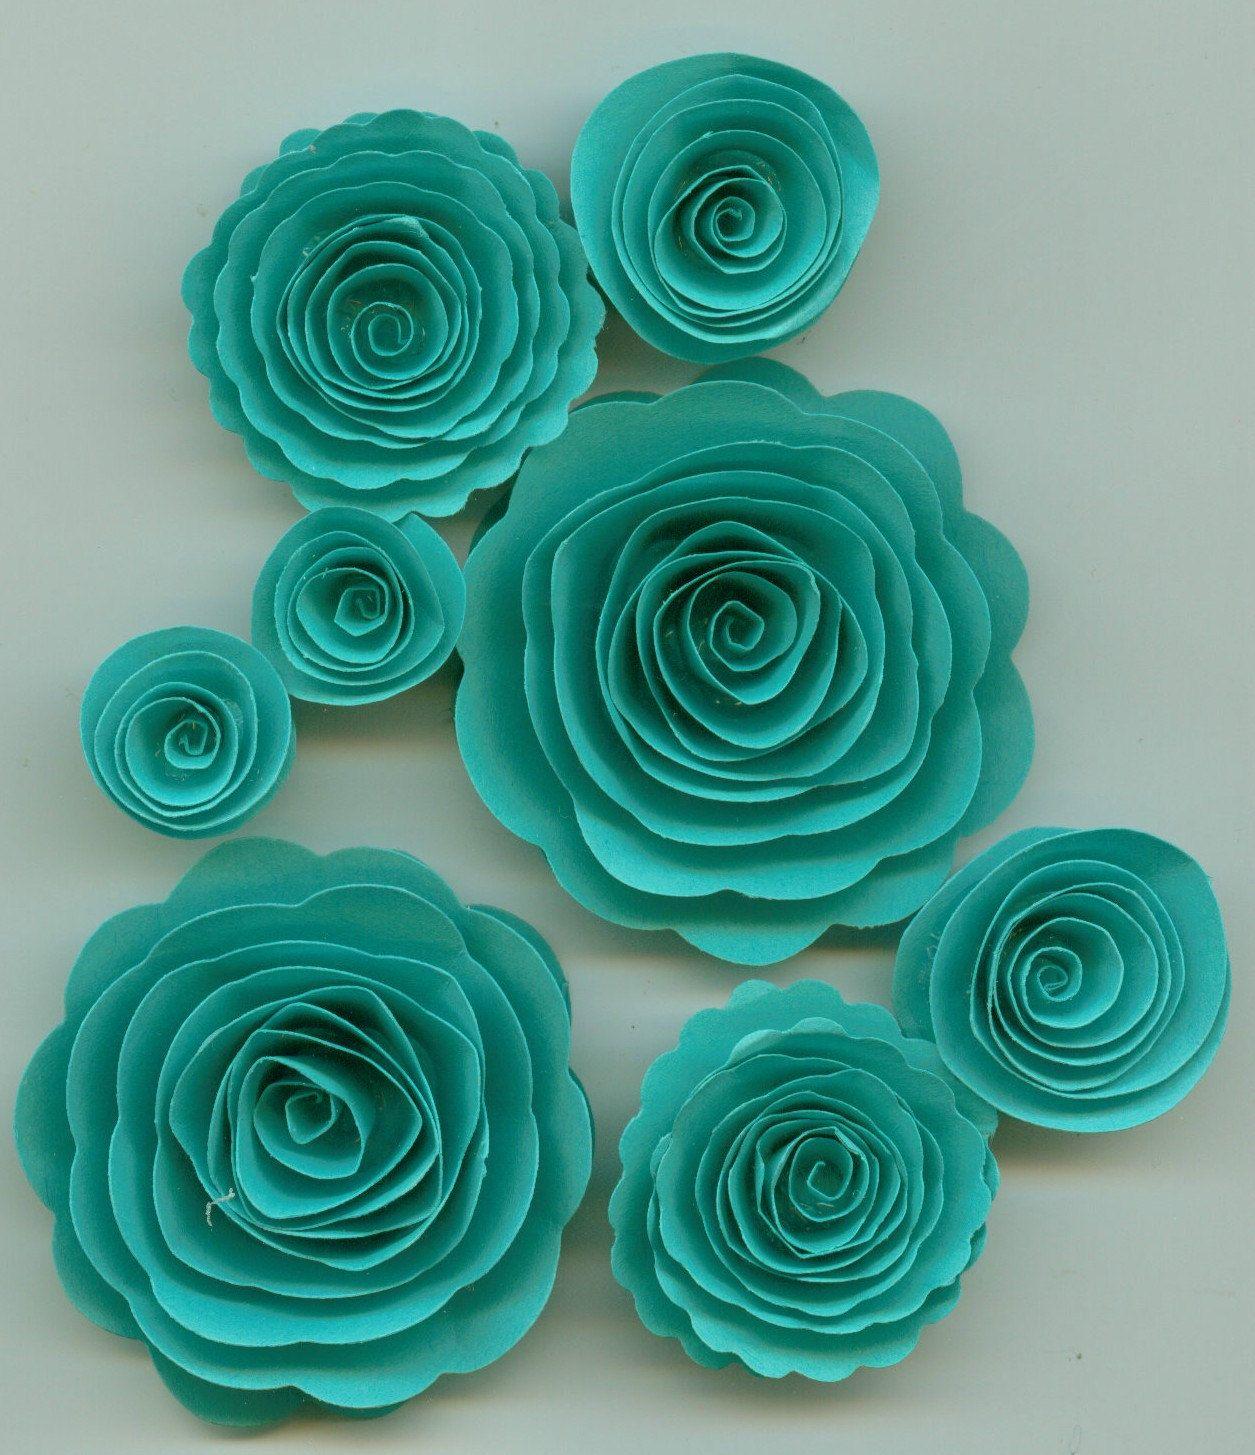 Tiffany blue handmade spiral rose paper flowers tiffany blue handmade spiral rose paper flowers izmirmasajfo